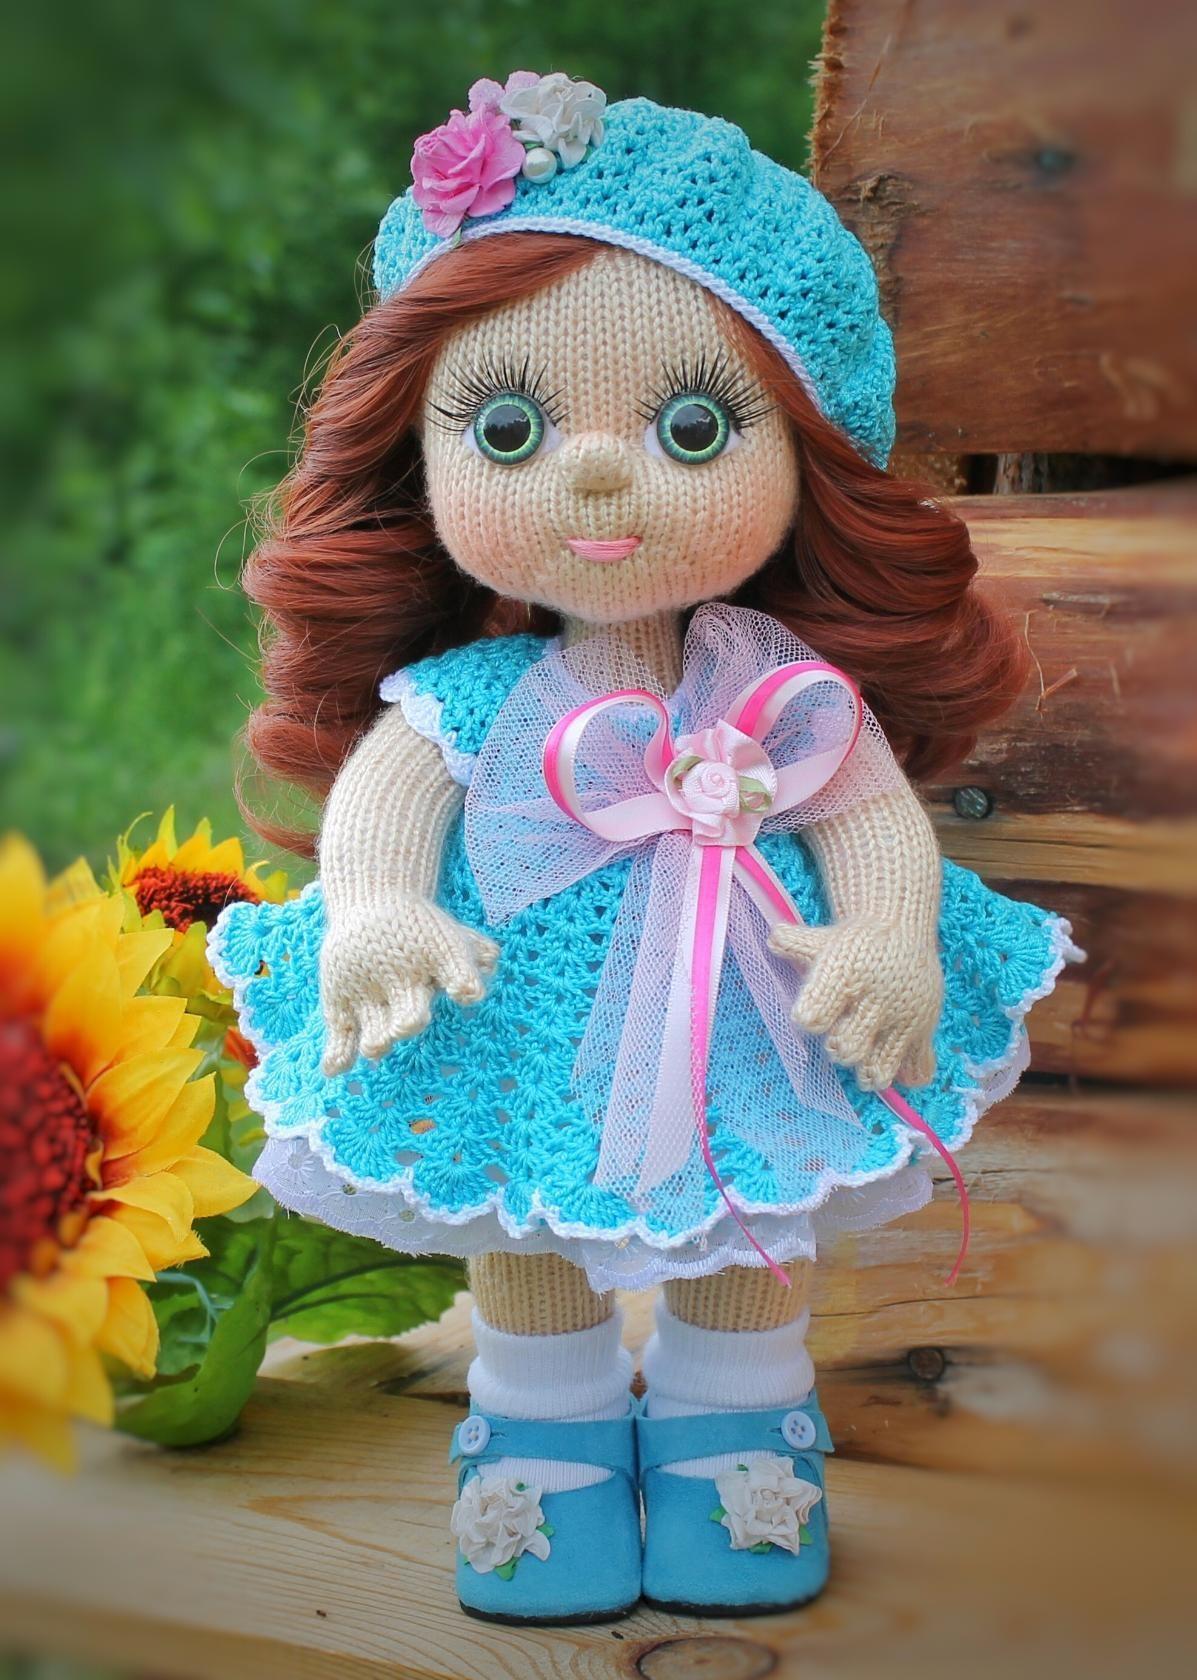 дизайна куклы амигуруми крючком фото хотите